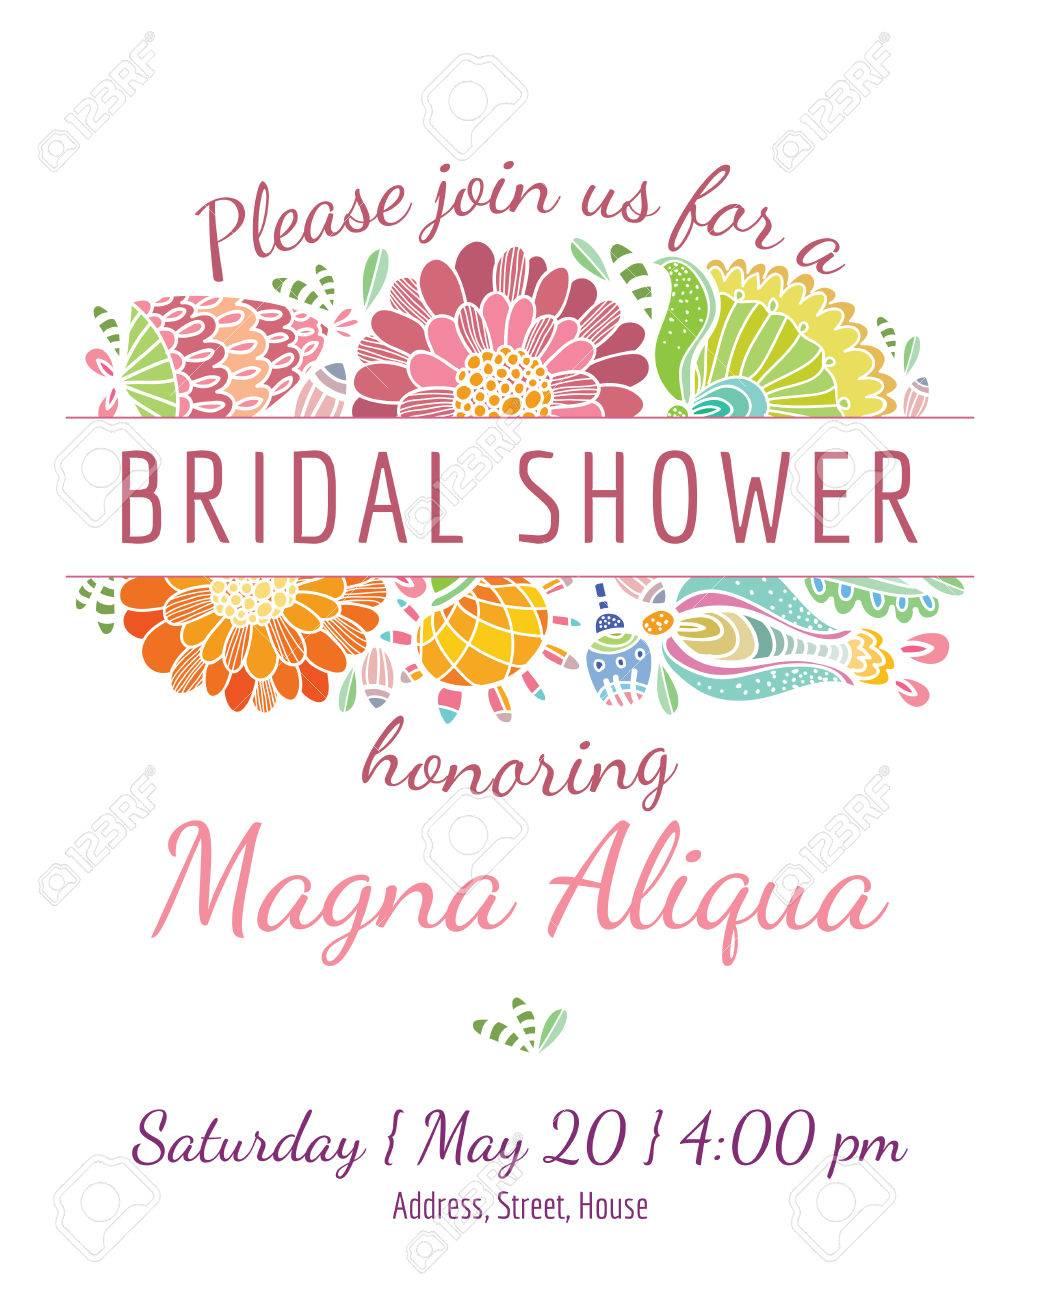 Invitation Bridal Shower Card Vector Template For Invitations - Bridal shower card template